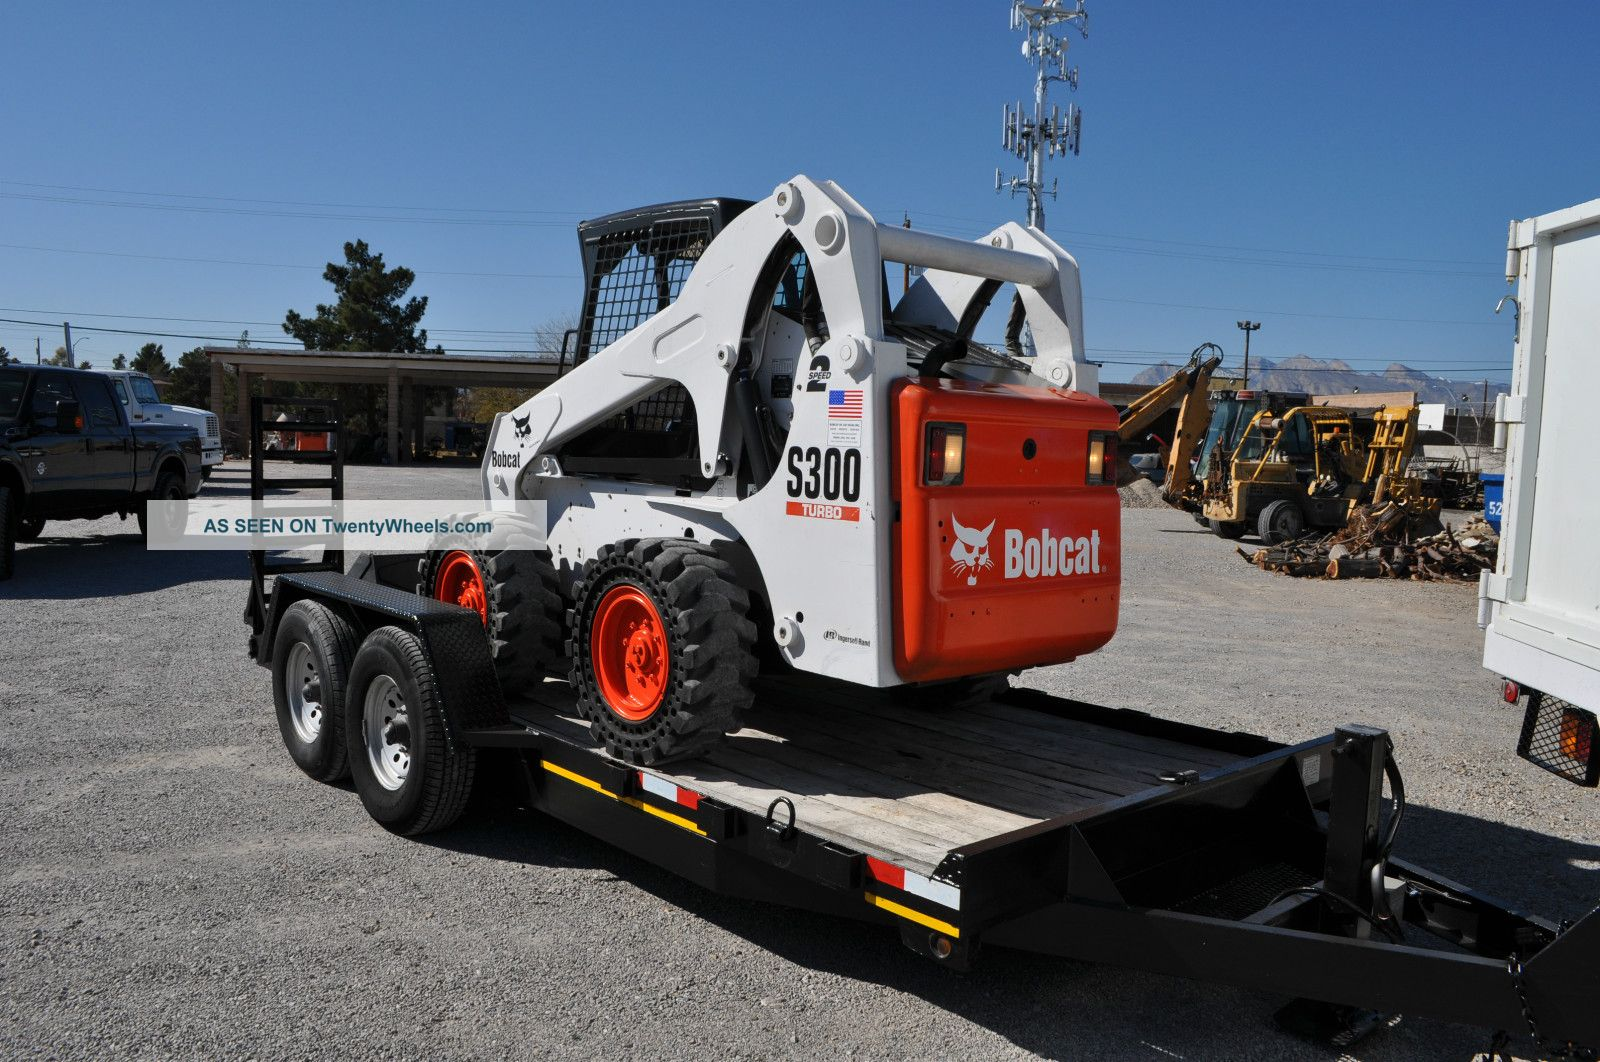 Bobcat Skid Steer Seat : Bobcat skid steer loader s spd suspension seat